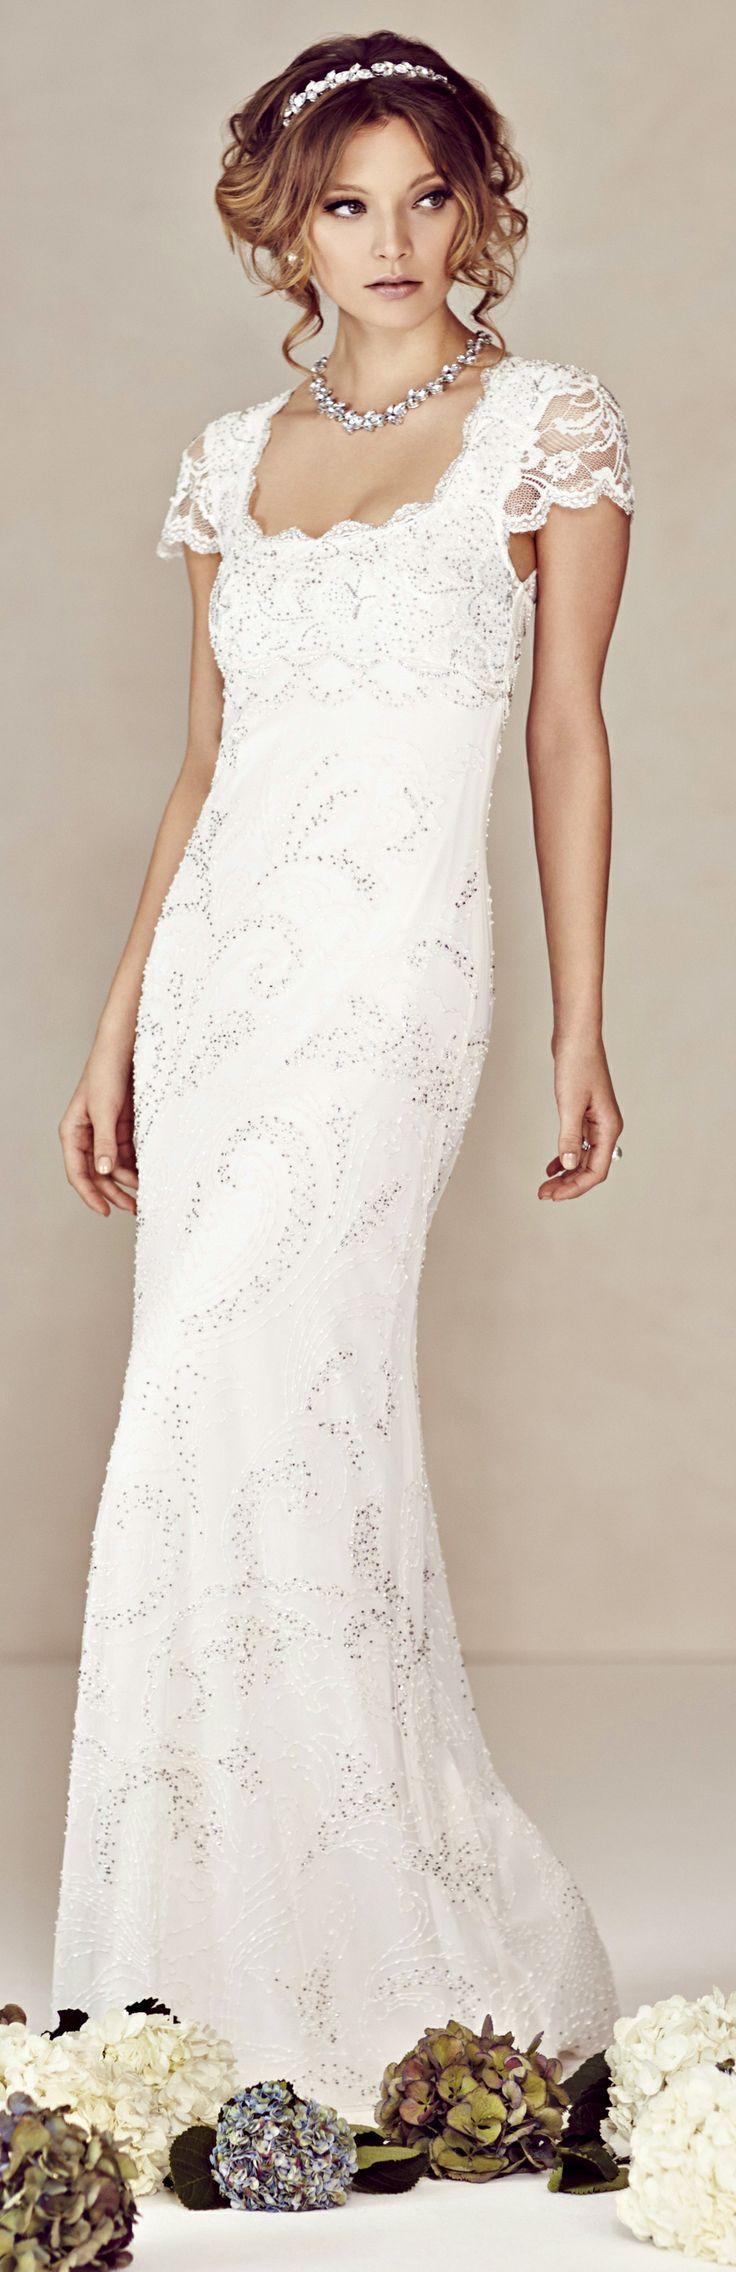 Wedding Dresses For Older Brides Nd Marriage Eaefdaaeaecfcc Dresses ...